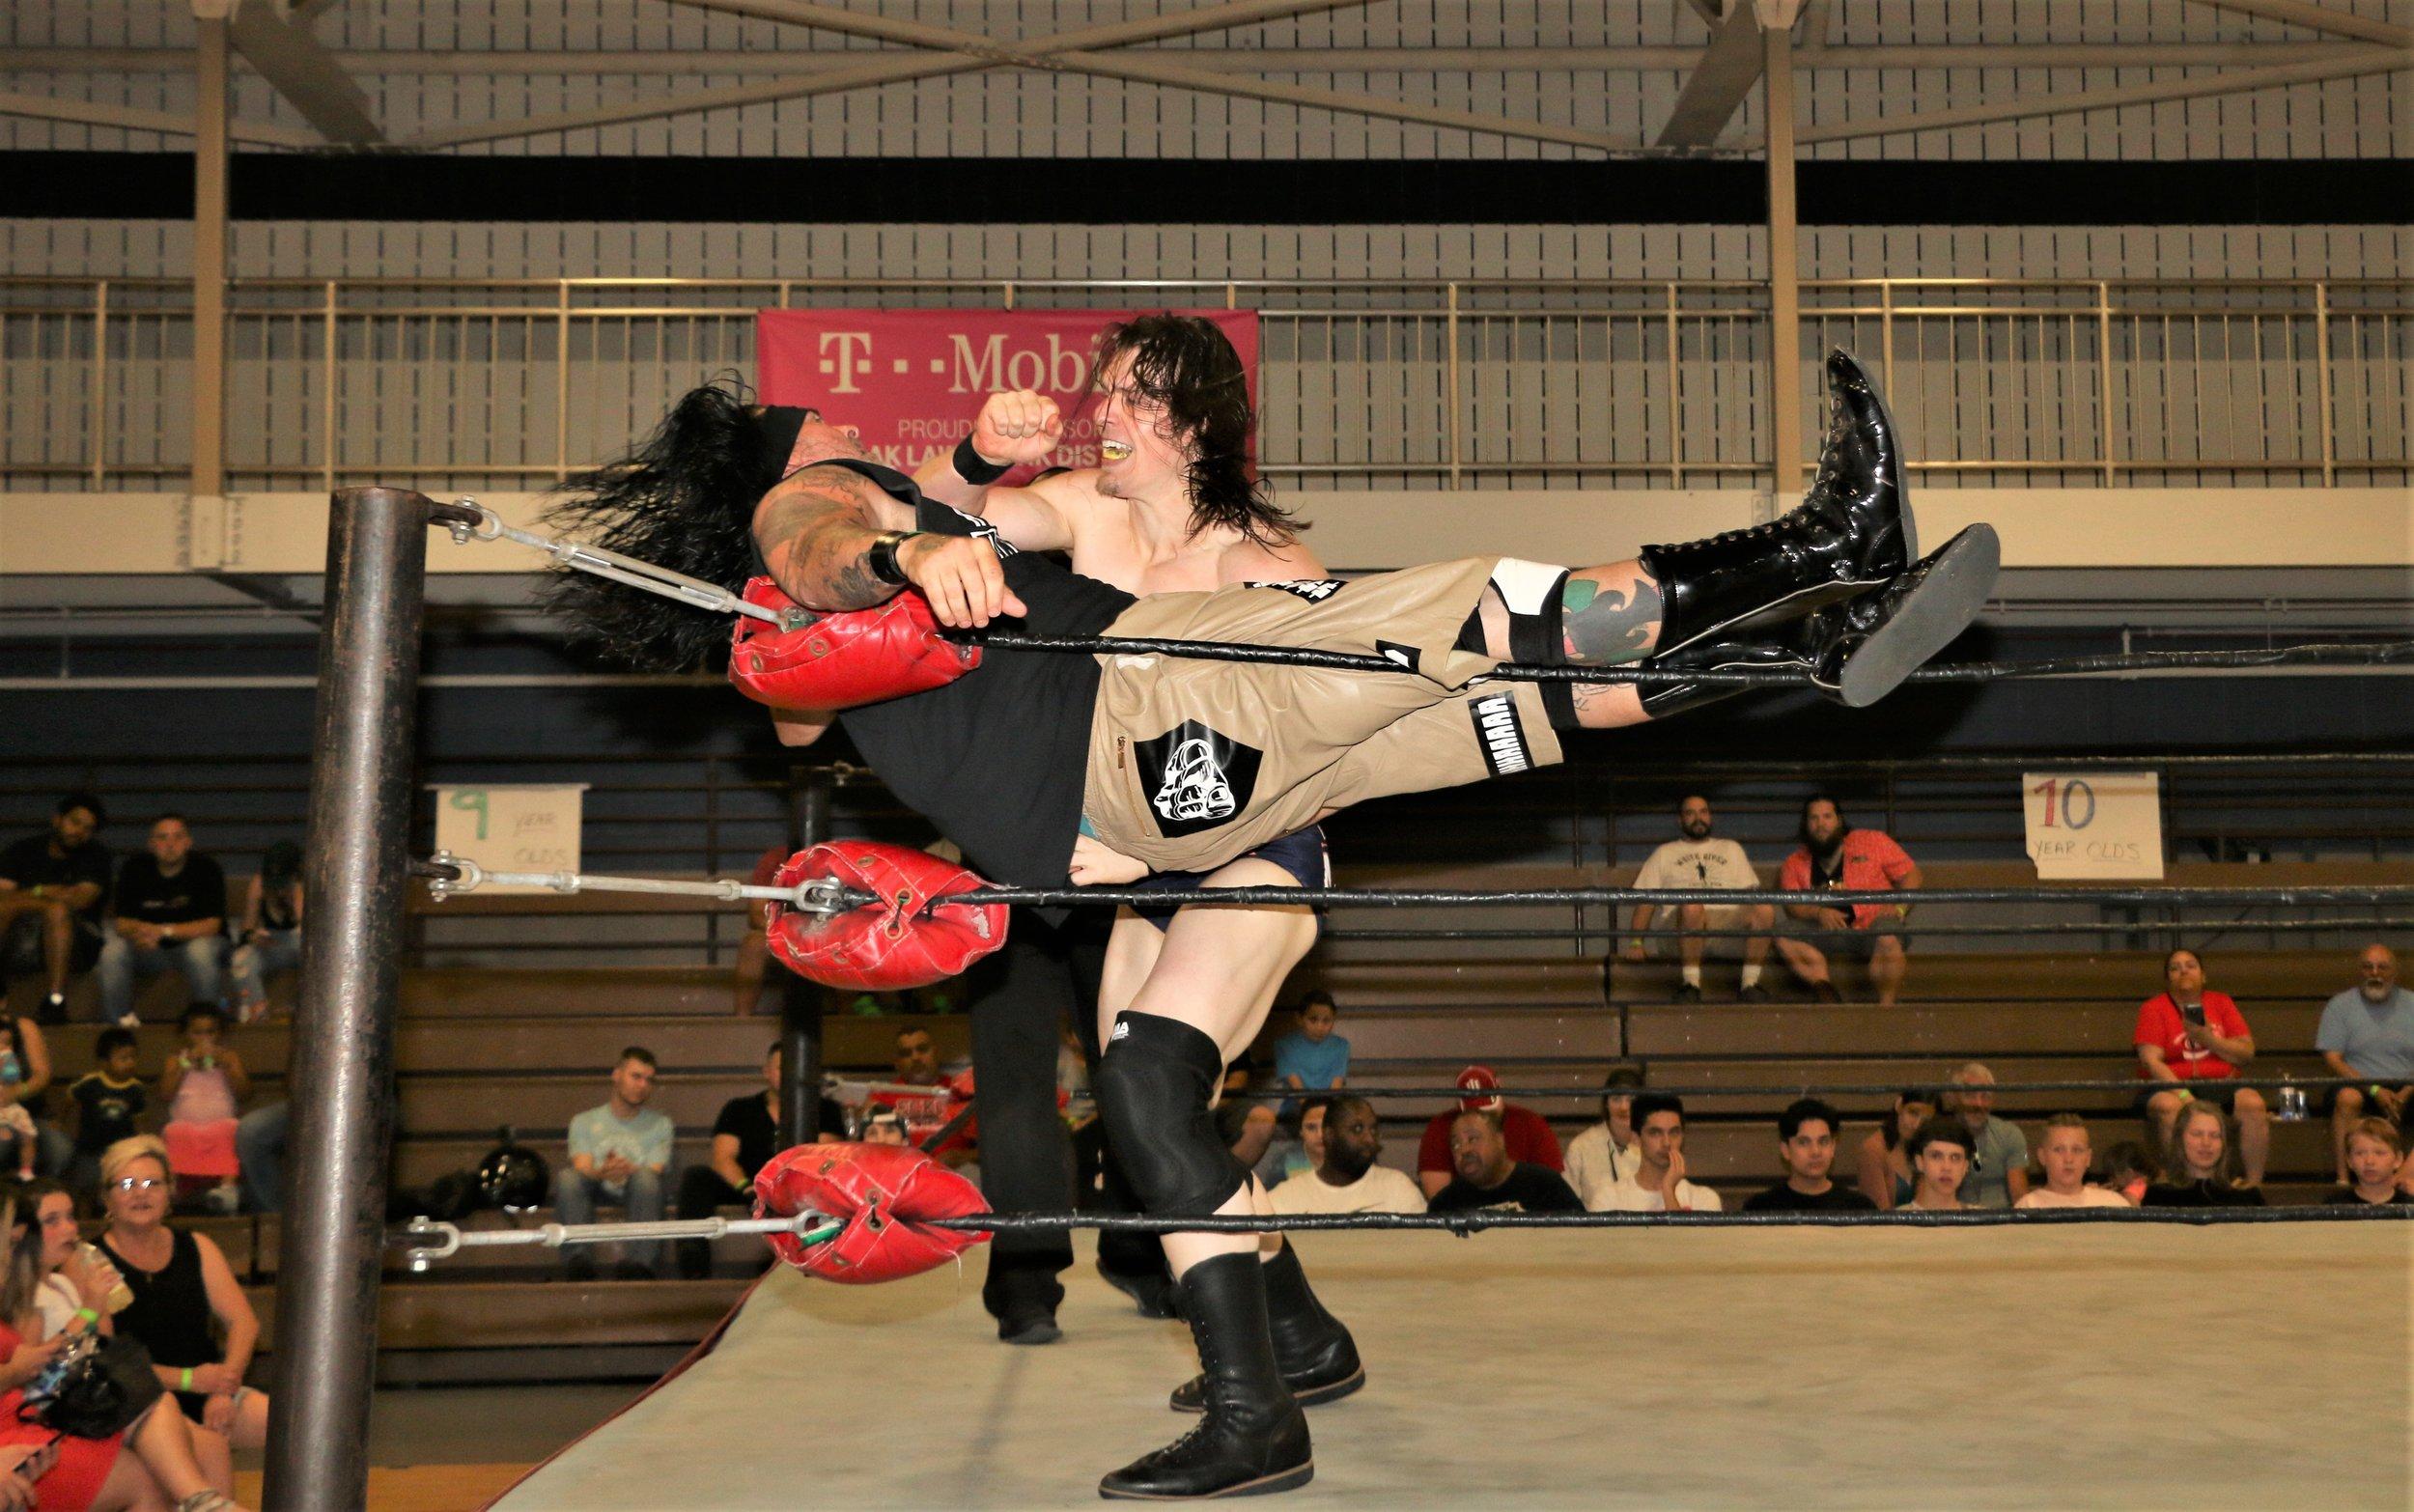 Logan Lynch attacks J Ca$h in the corner.